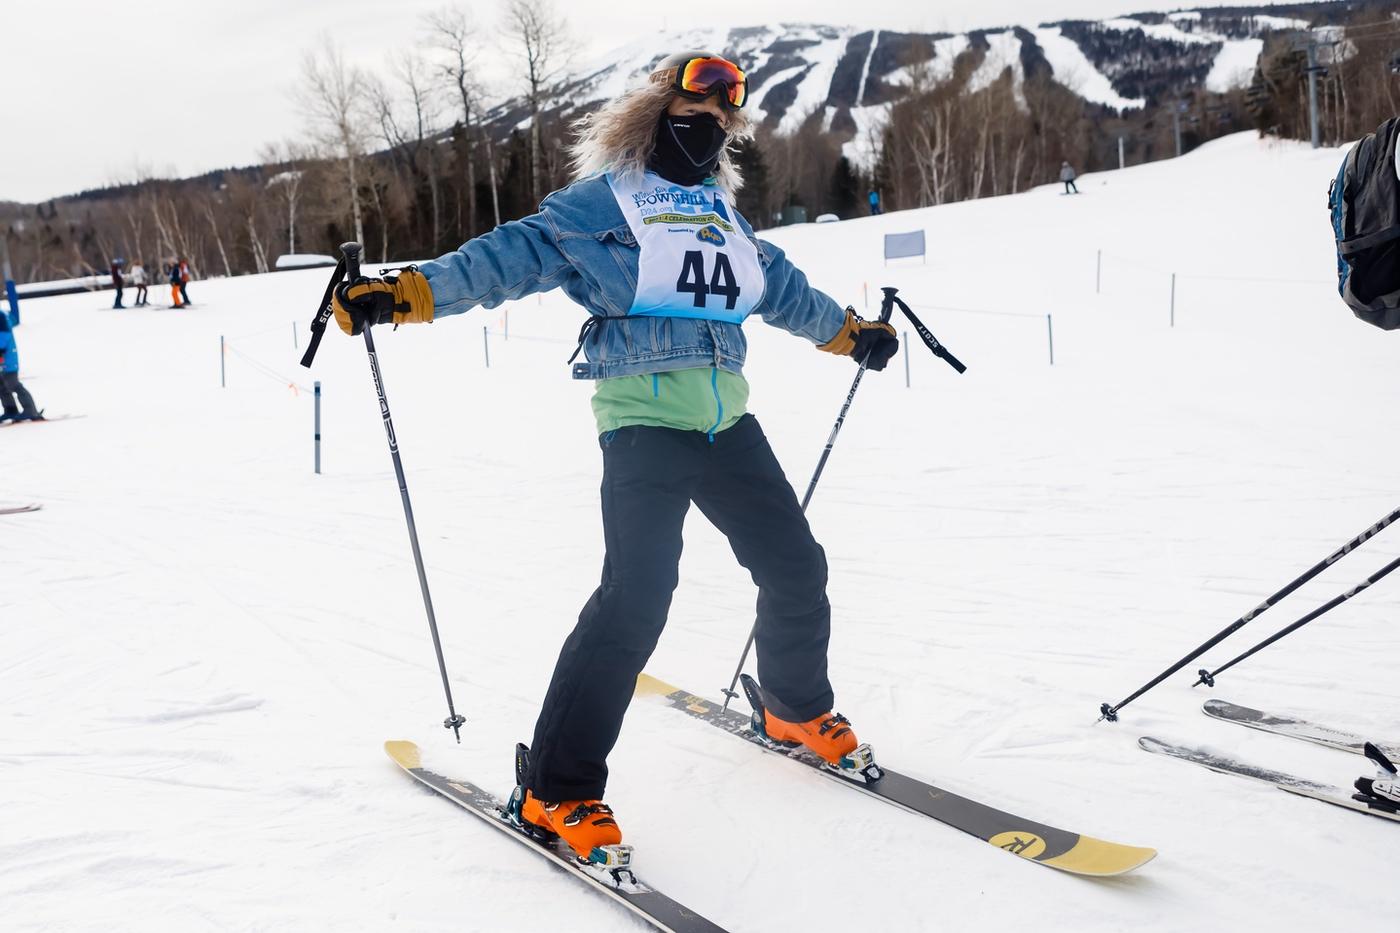 WinterKids Downhill 24 2021 SDP 2982